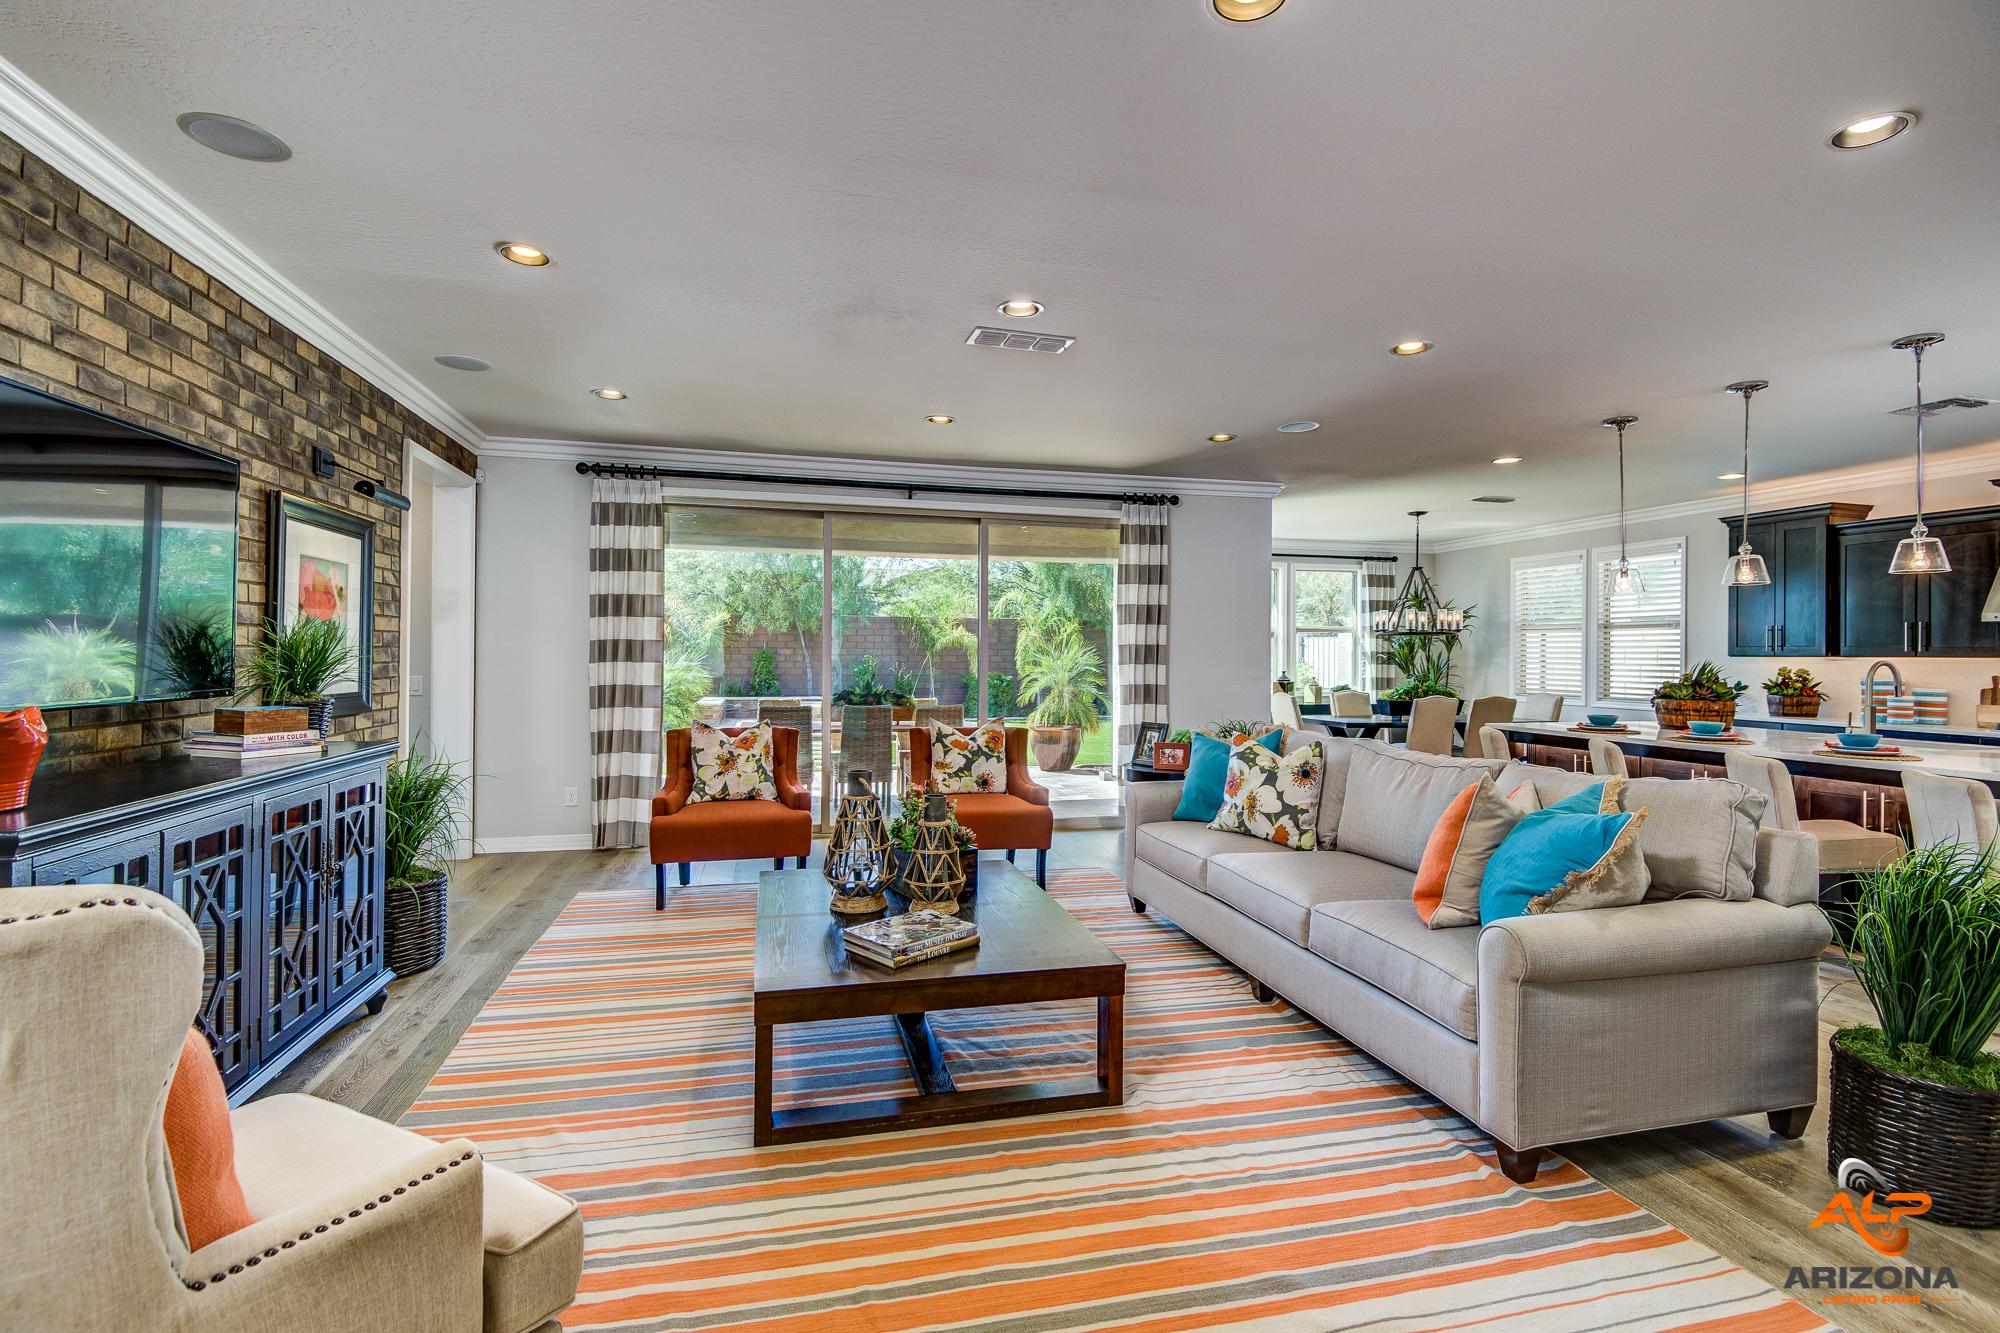 Eastmark Legacy, Mesa Arizona, #3, Desire Model, DSC_7674, Interior Real Estate Photography.jpg